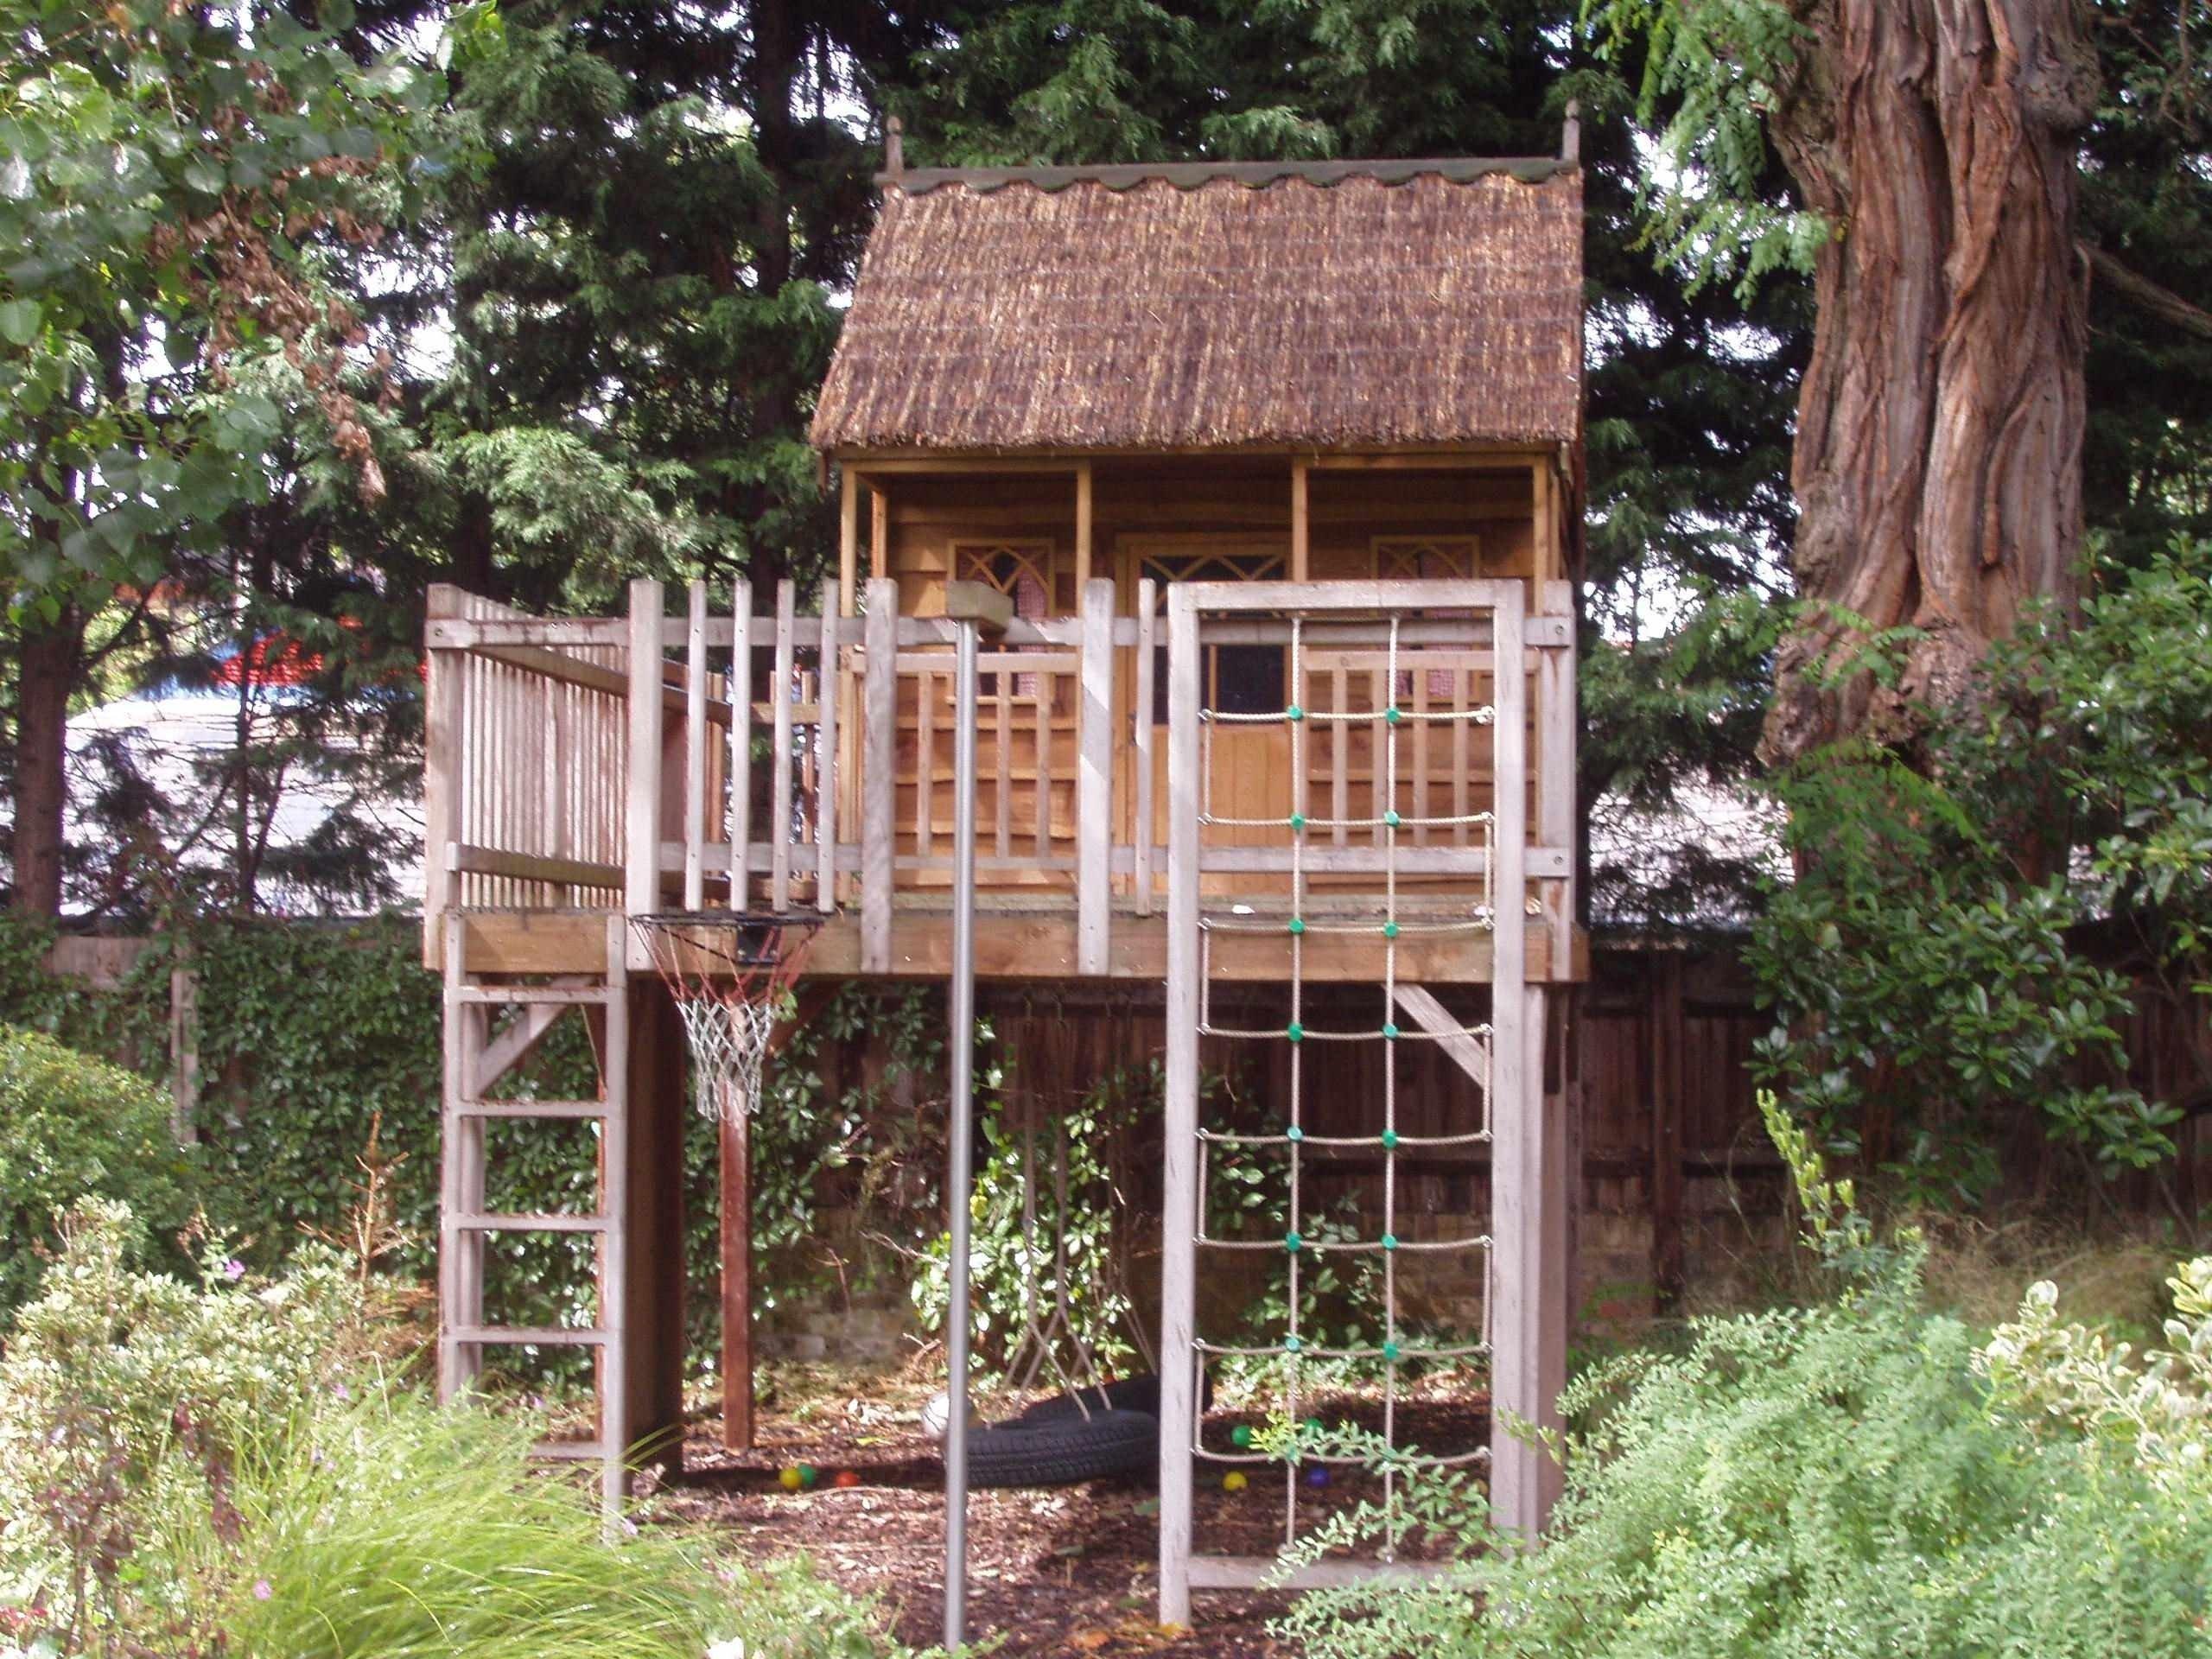 10 Wonderful Tree House Ideas For Kids decorating house tree designs and plans for kids decorating 2020